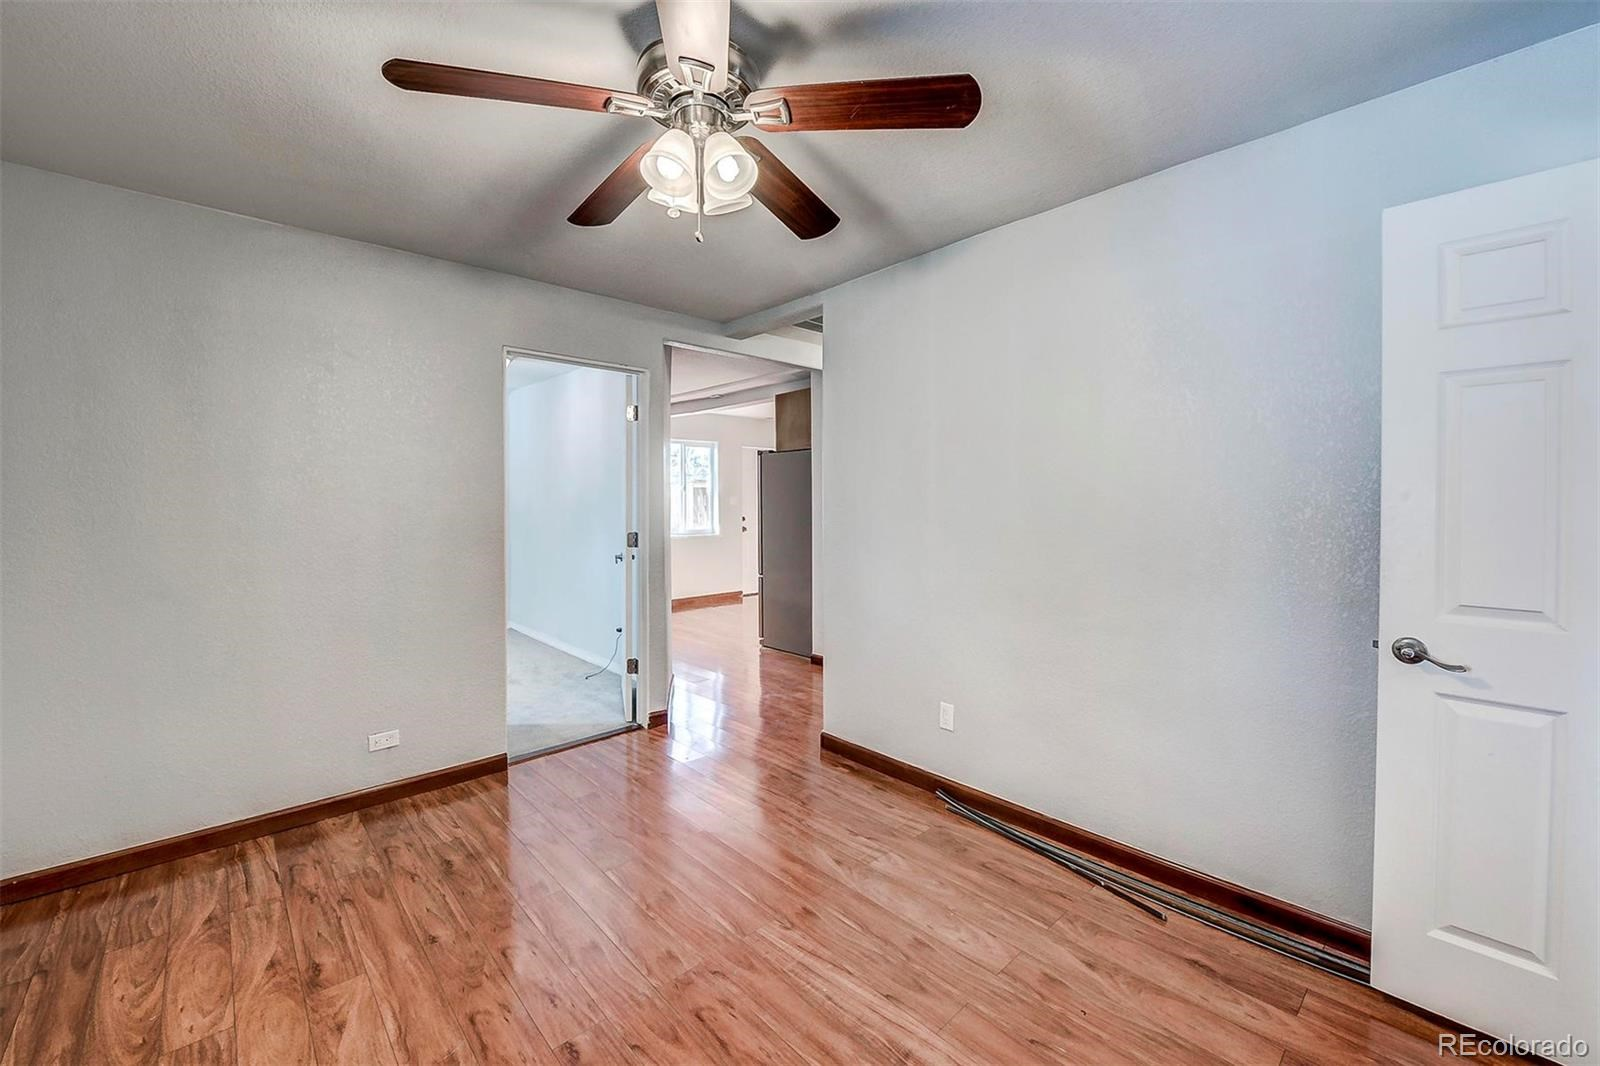 MLS# 4276905 - 2 - 49 S Wolff Street, Denver, CO 80219